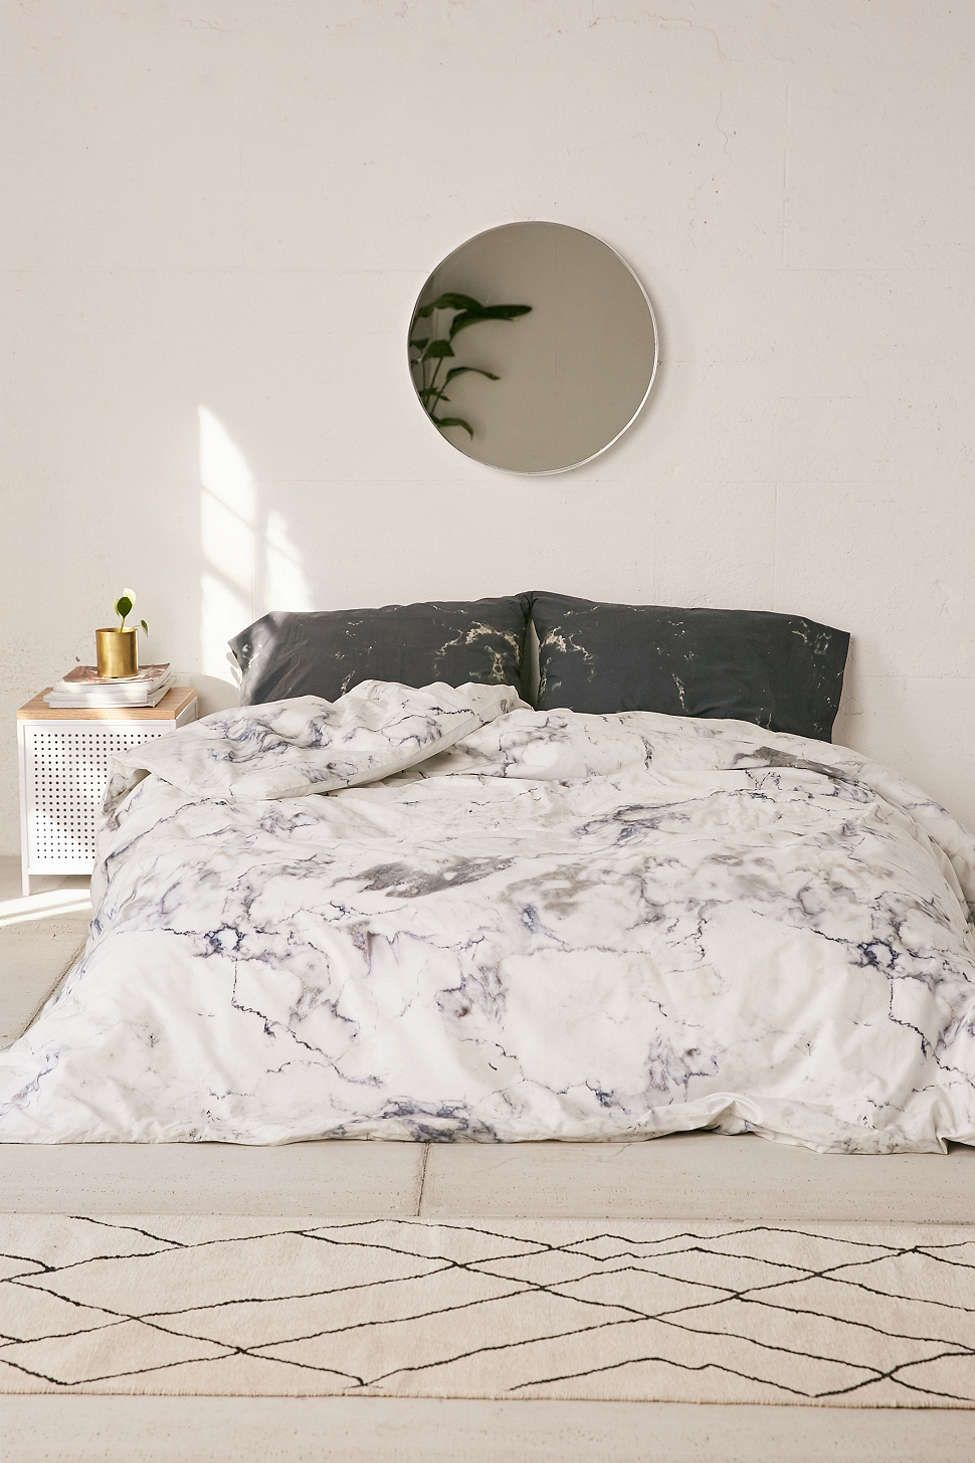 Marble Bedroom: 20 Refreshing Modern Bedroom Design Ideas